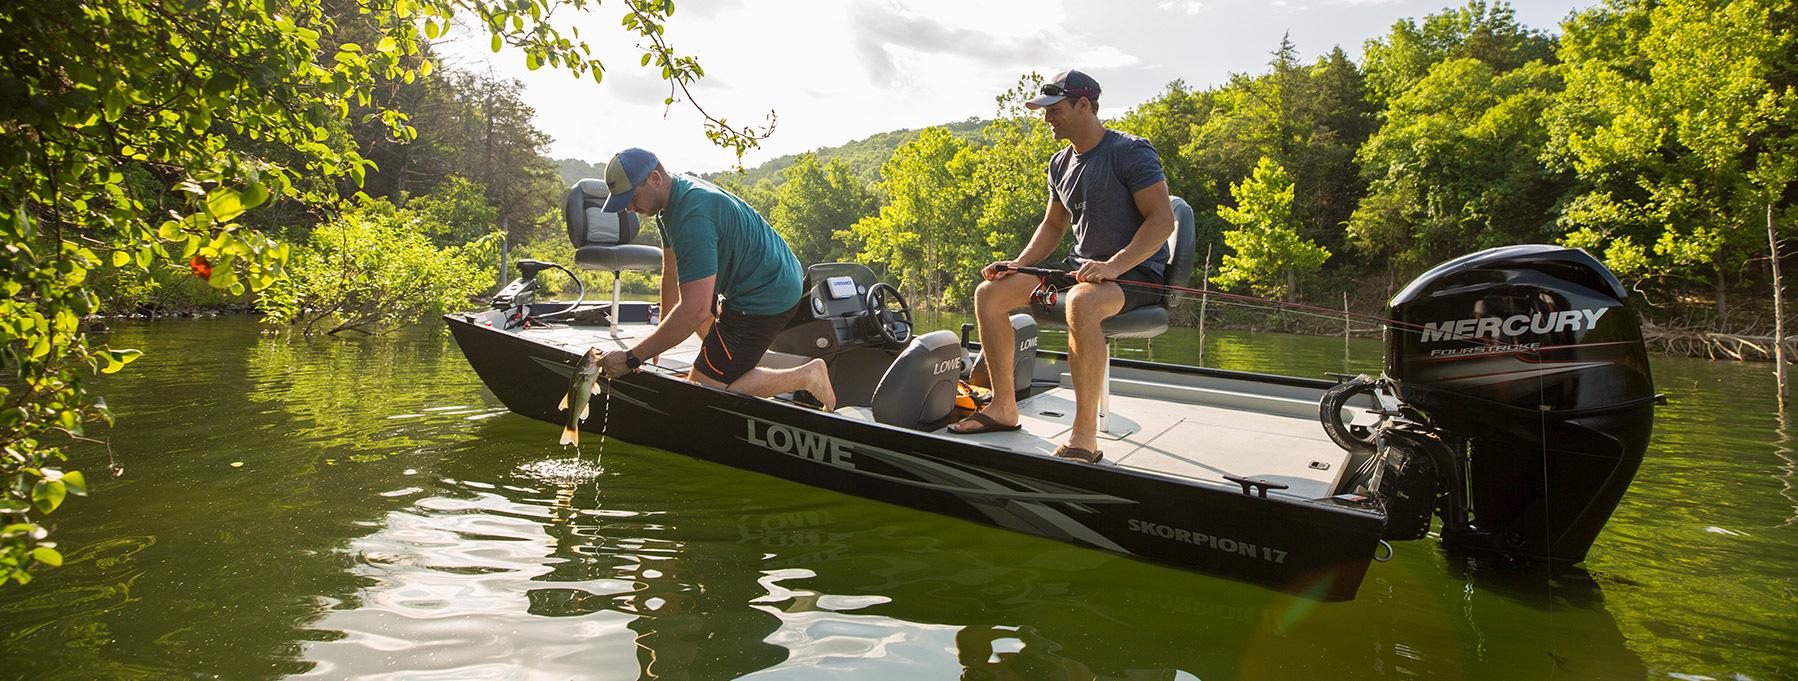 2020 Skorpion 17 Mod-V Boat, Bass Fishing Boat | Lowe Boats